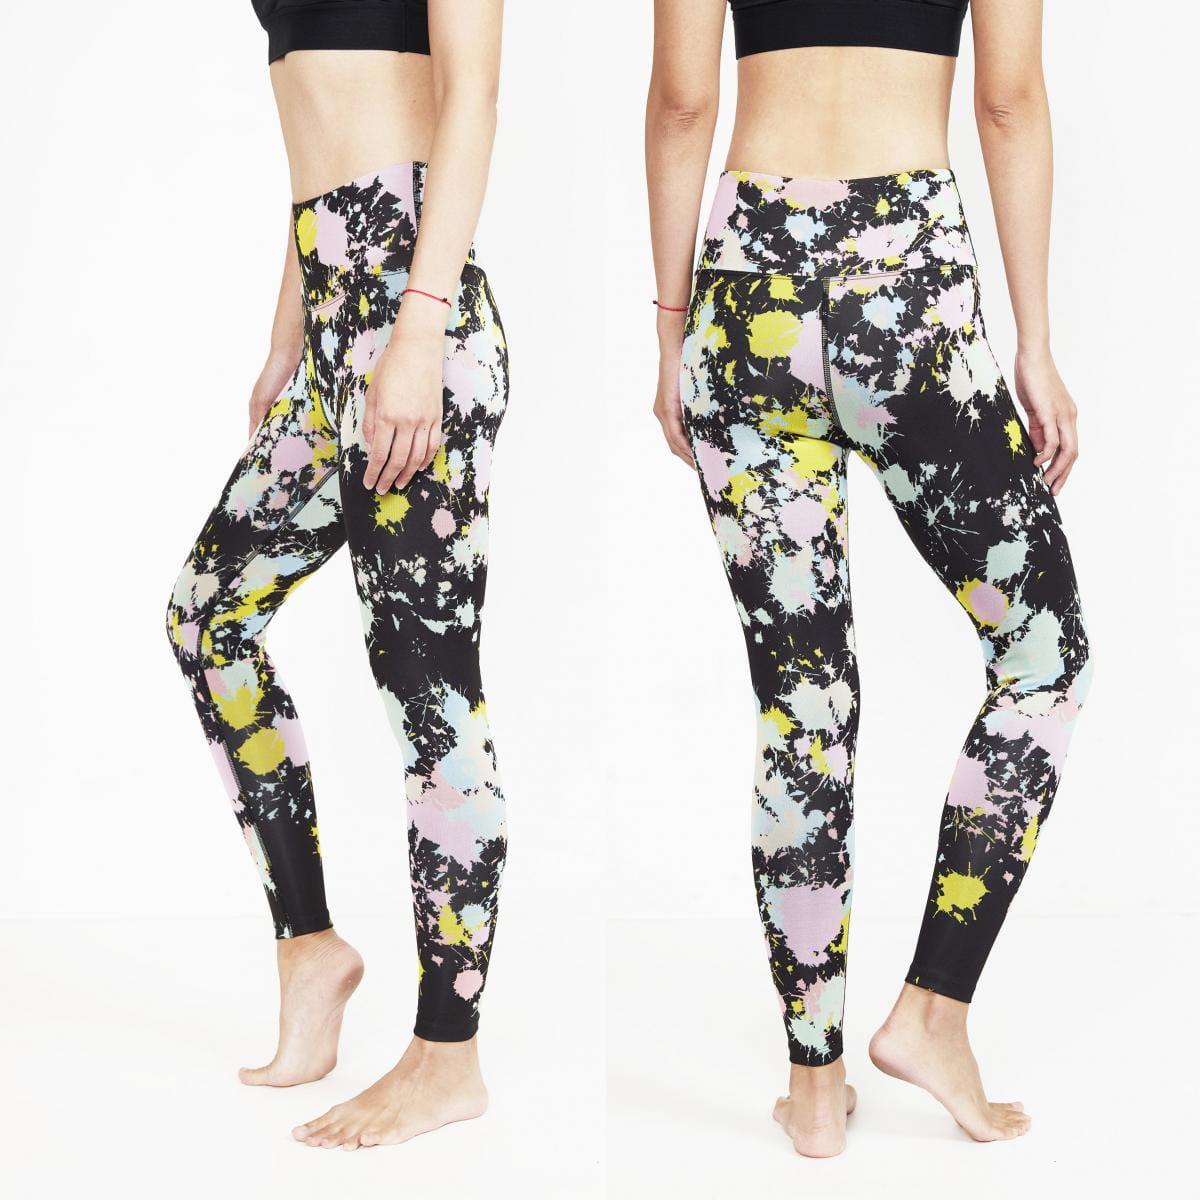 【ELASTI】典莎瑜珈褲(碘紗抗菌除臭機能)-恣意揮灑 2